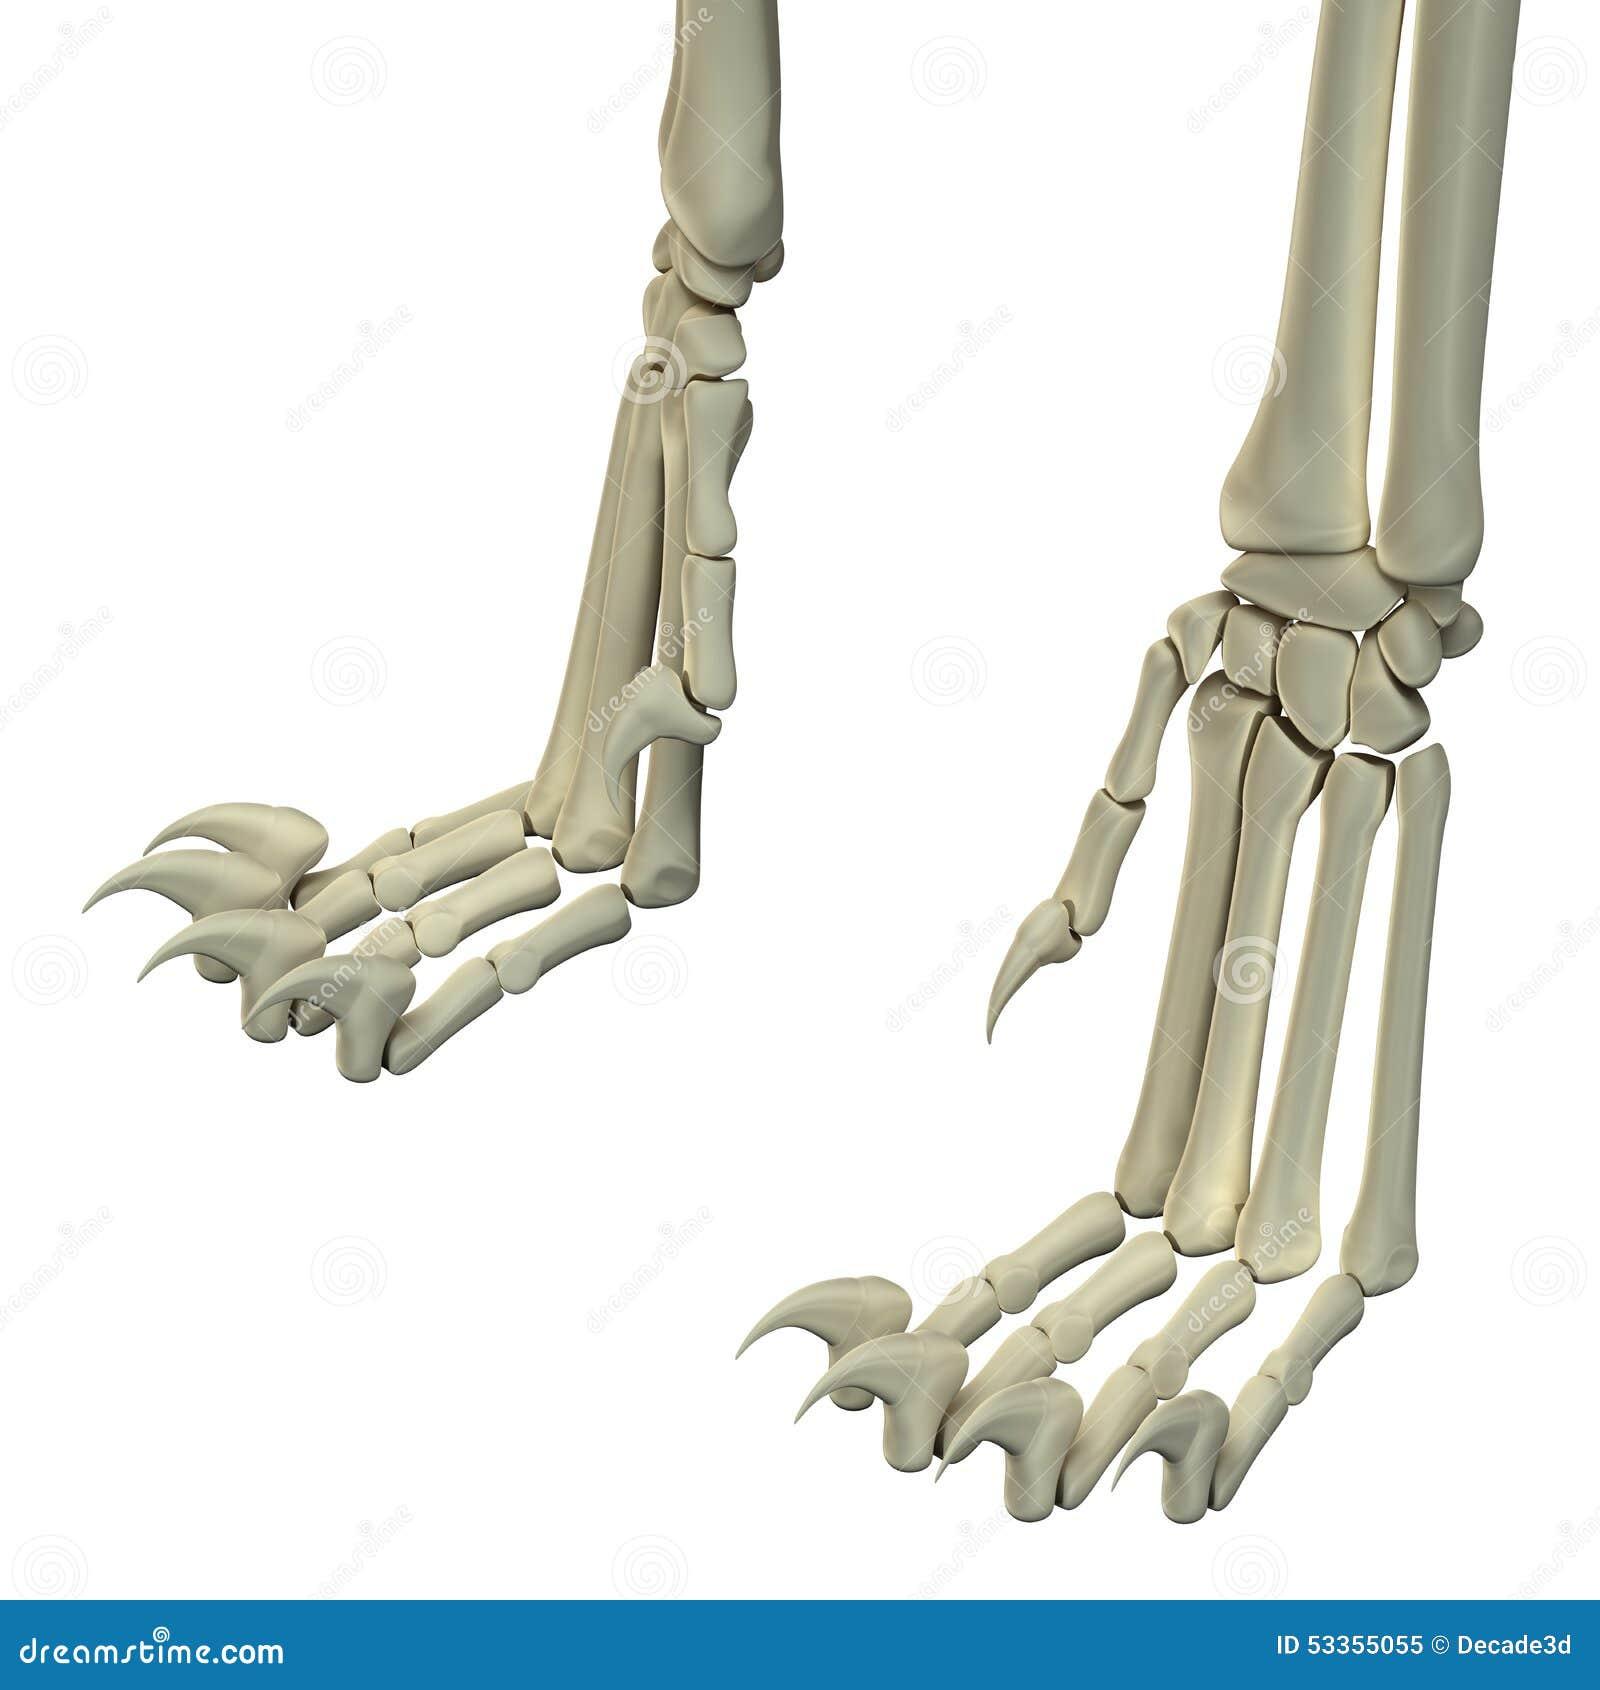 cat hind legs anatomy bones stock photo image 53355055 clip art kitten images clip art kittens